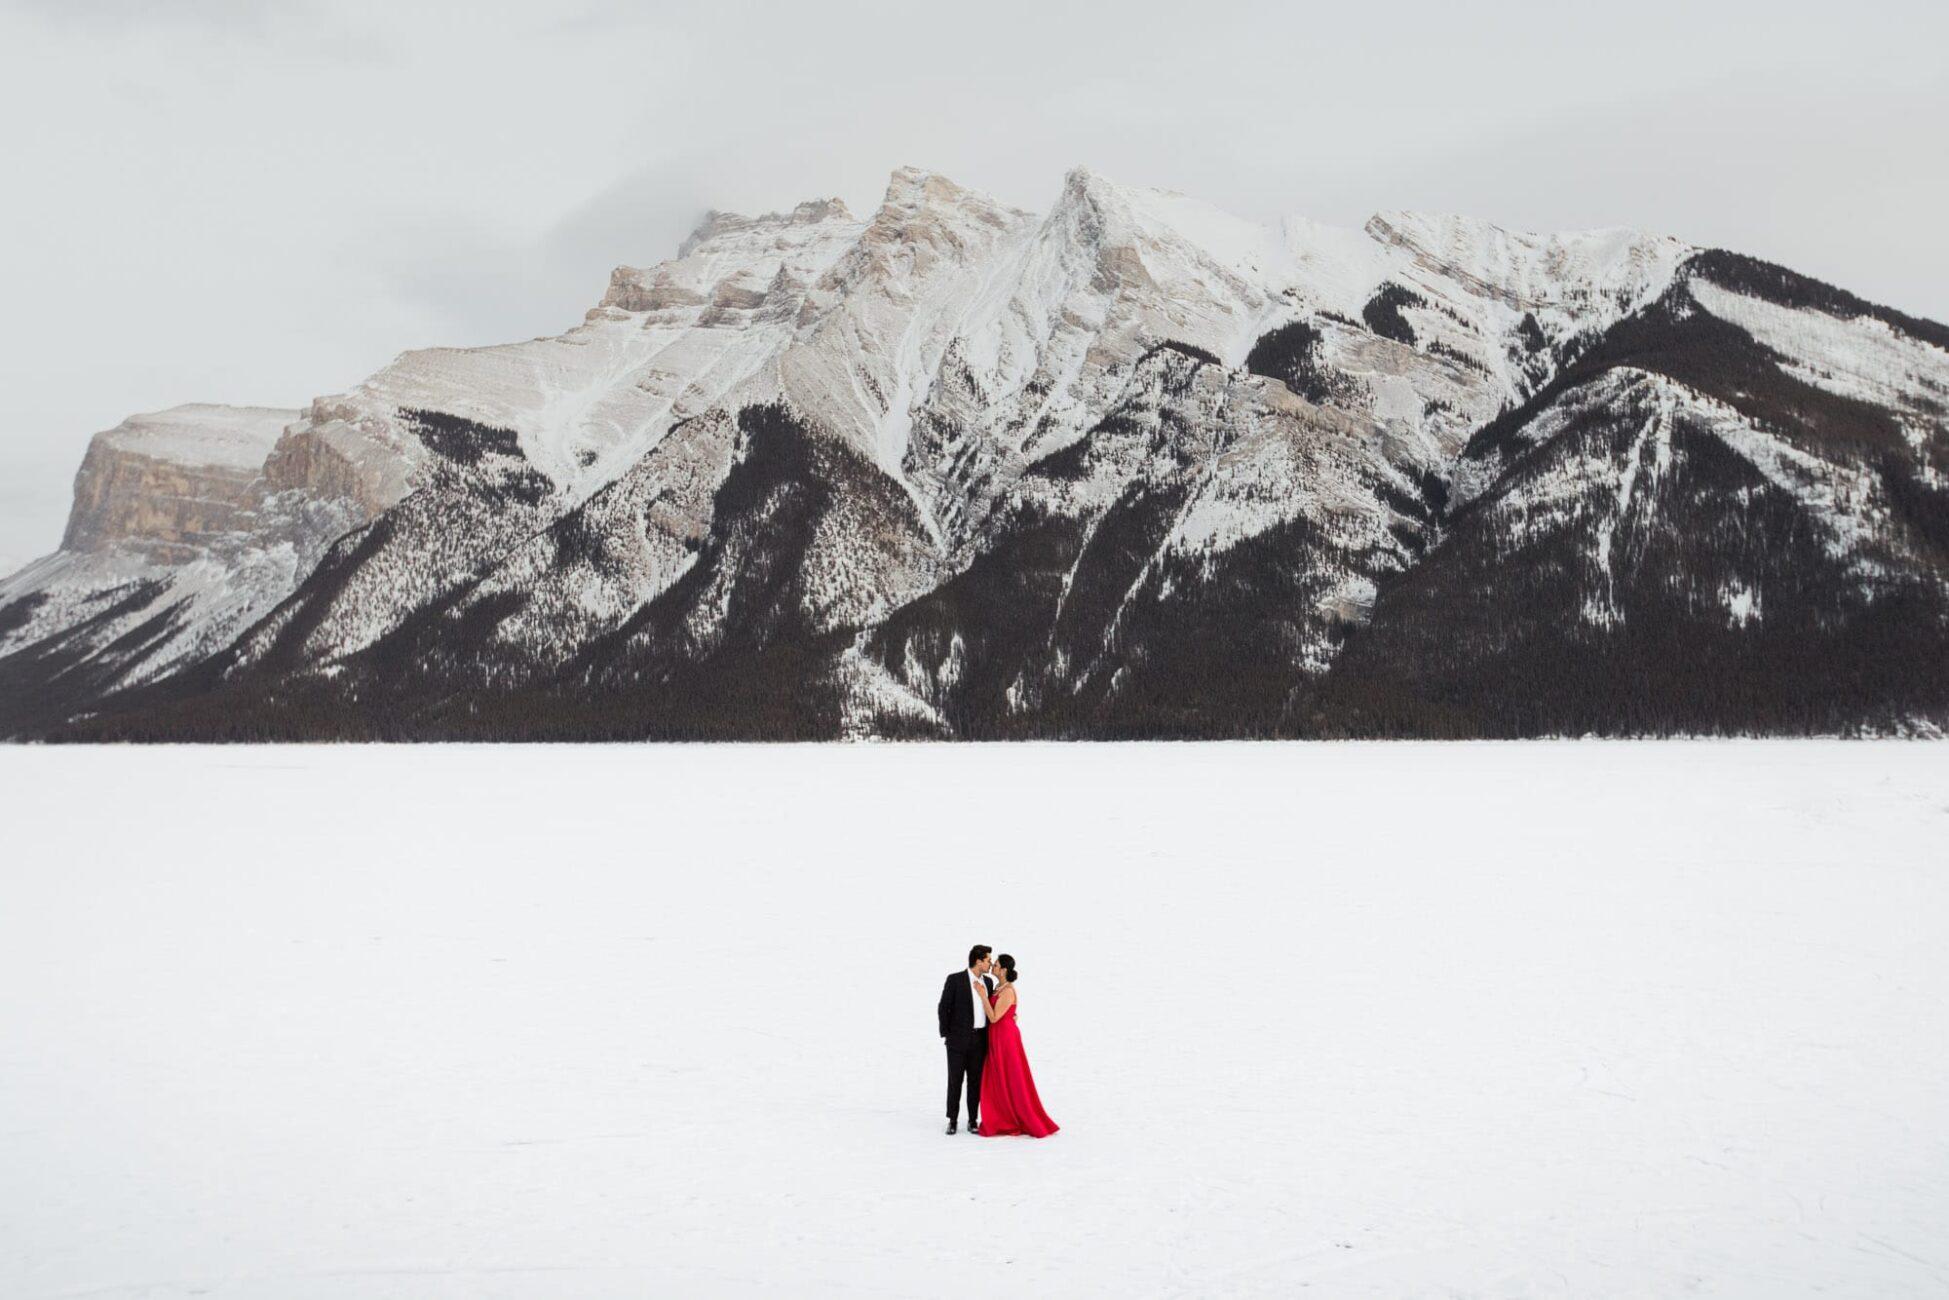 Banff Winter Engagement Session